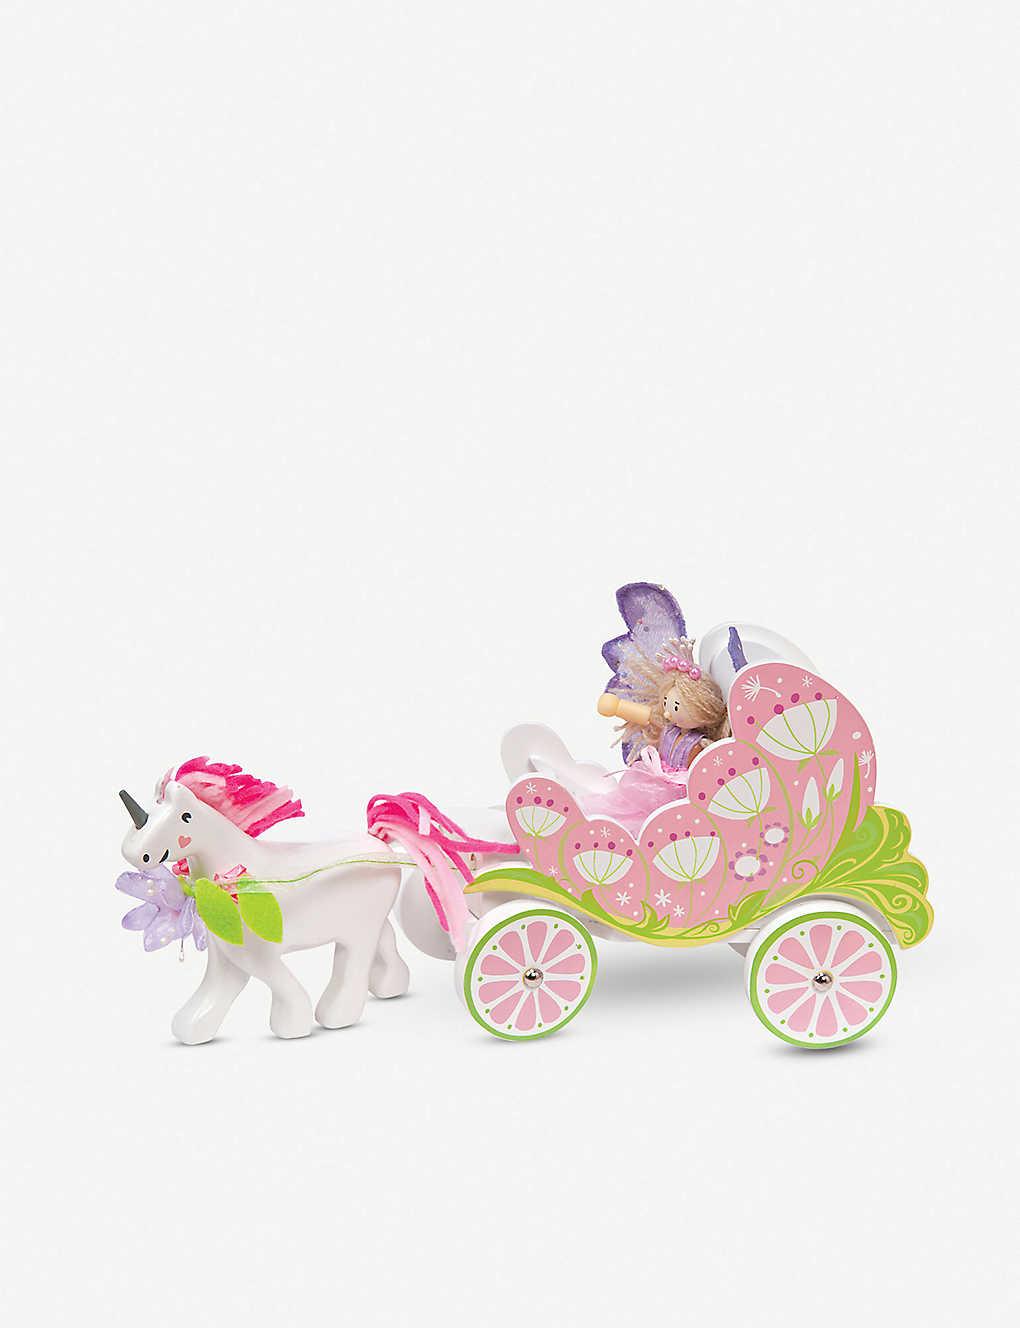 Horse Pony Personalised Shoulder Messenger Bag Gift Birthday Girl Mobile ipad